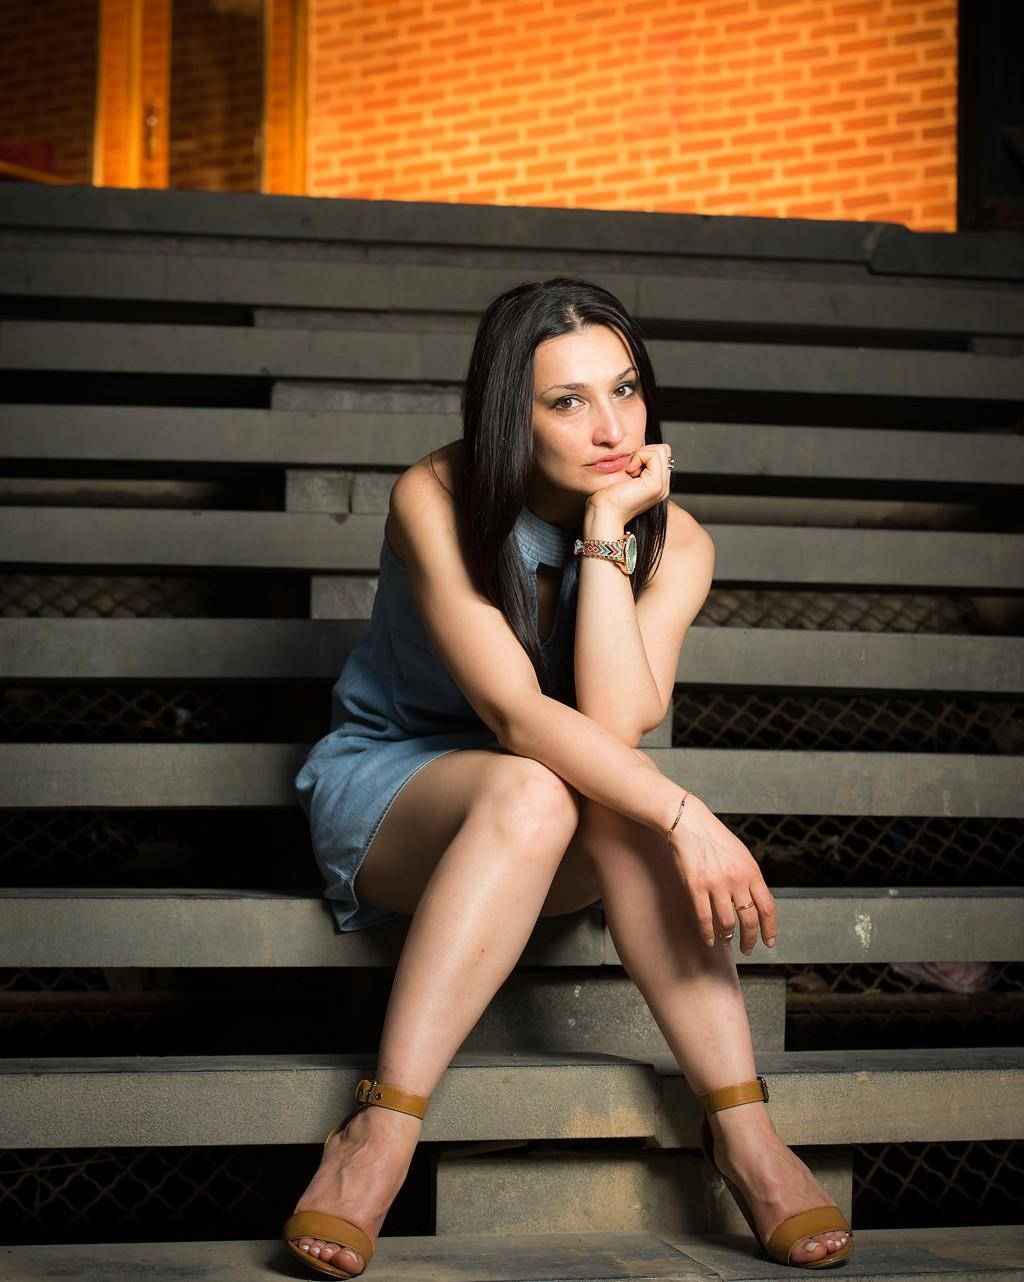 Anahit host of Viva La Flora Live Podcast seating on steps